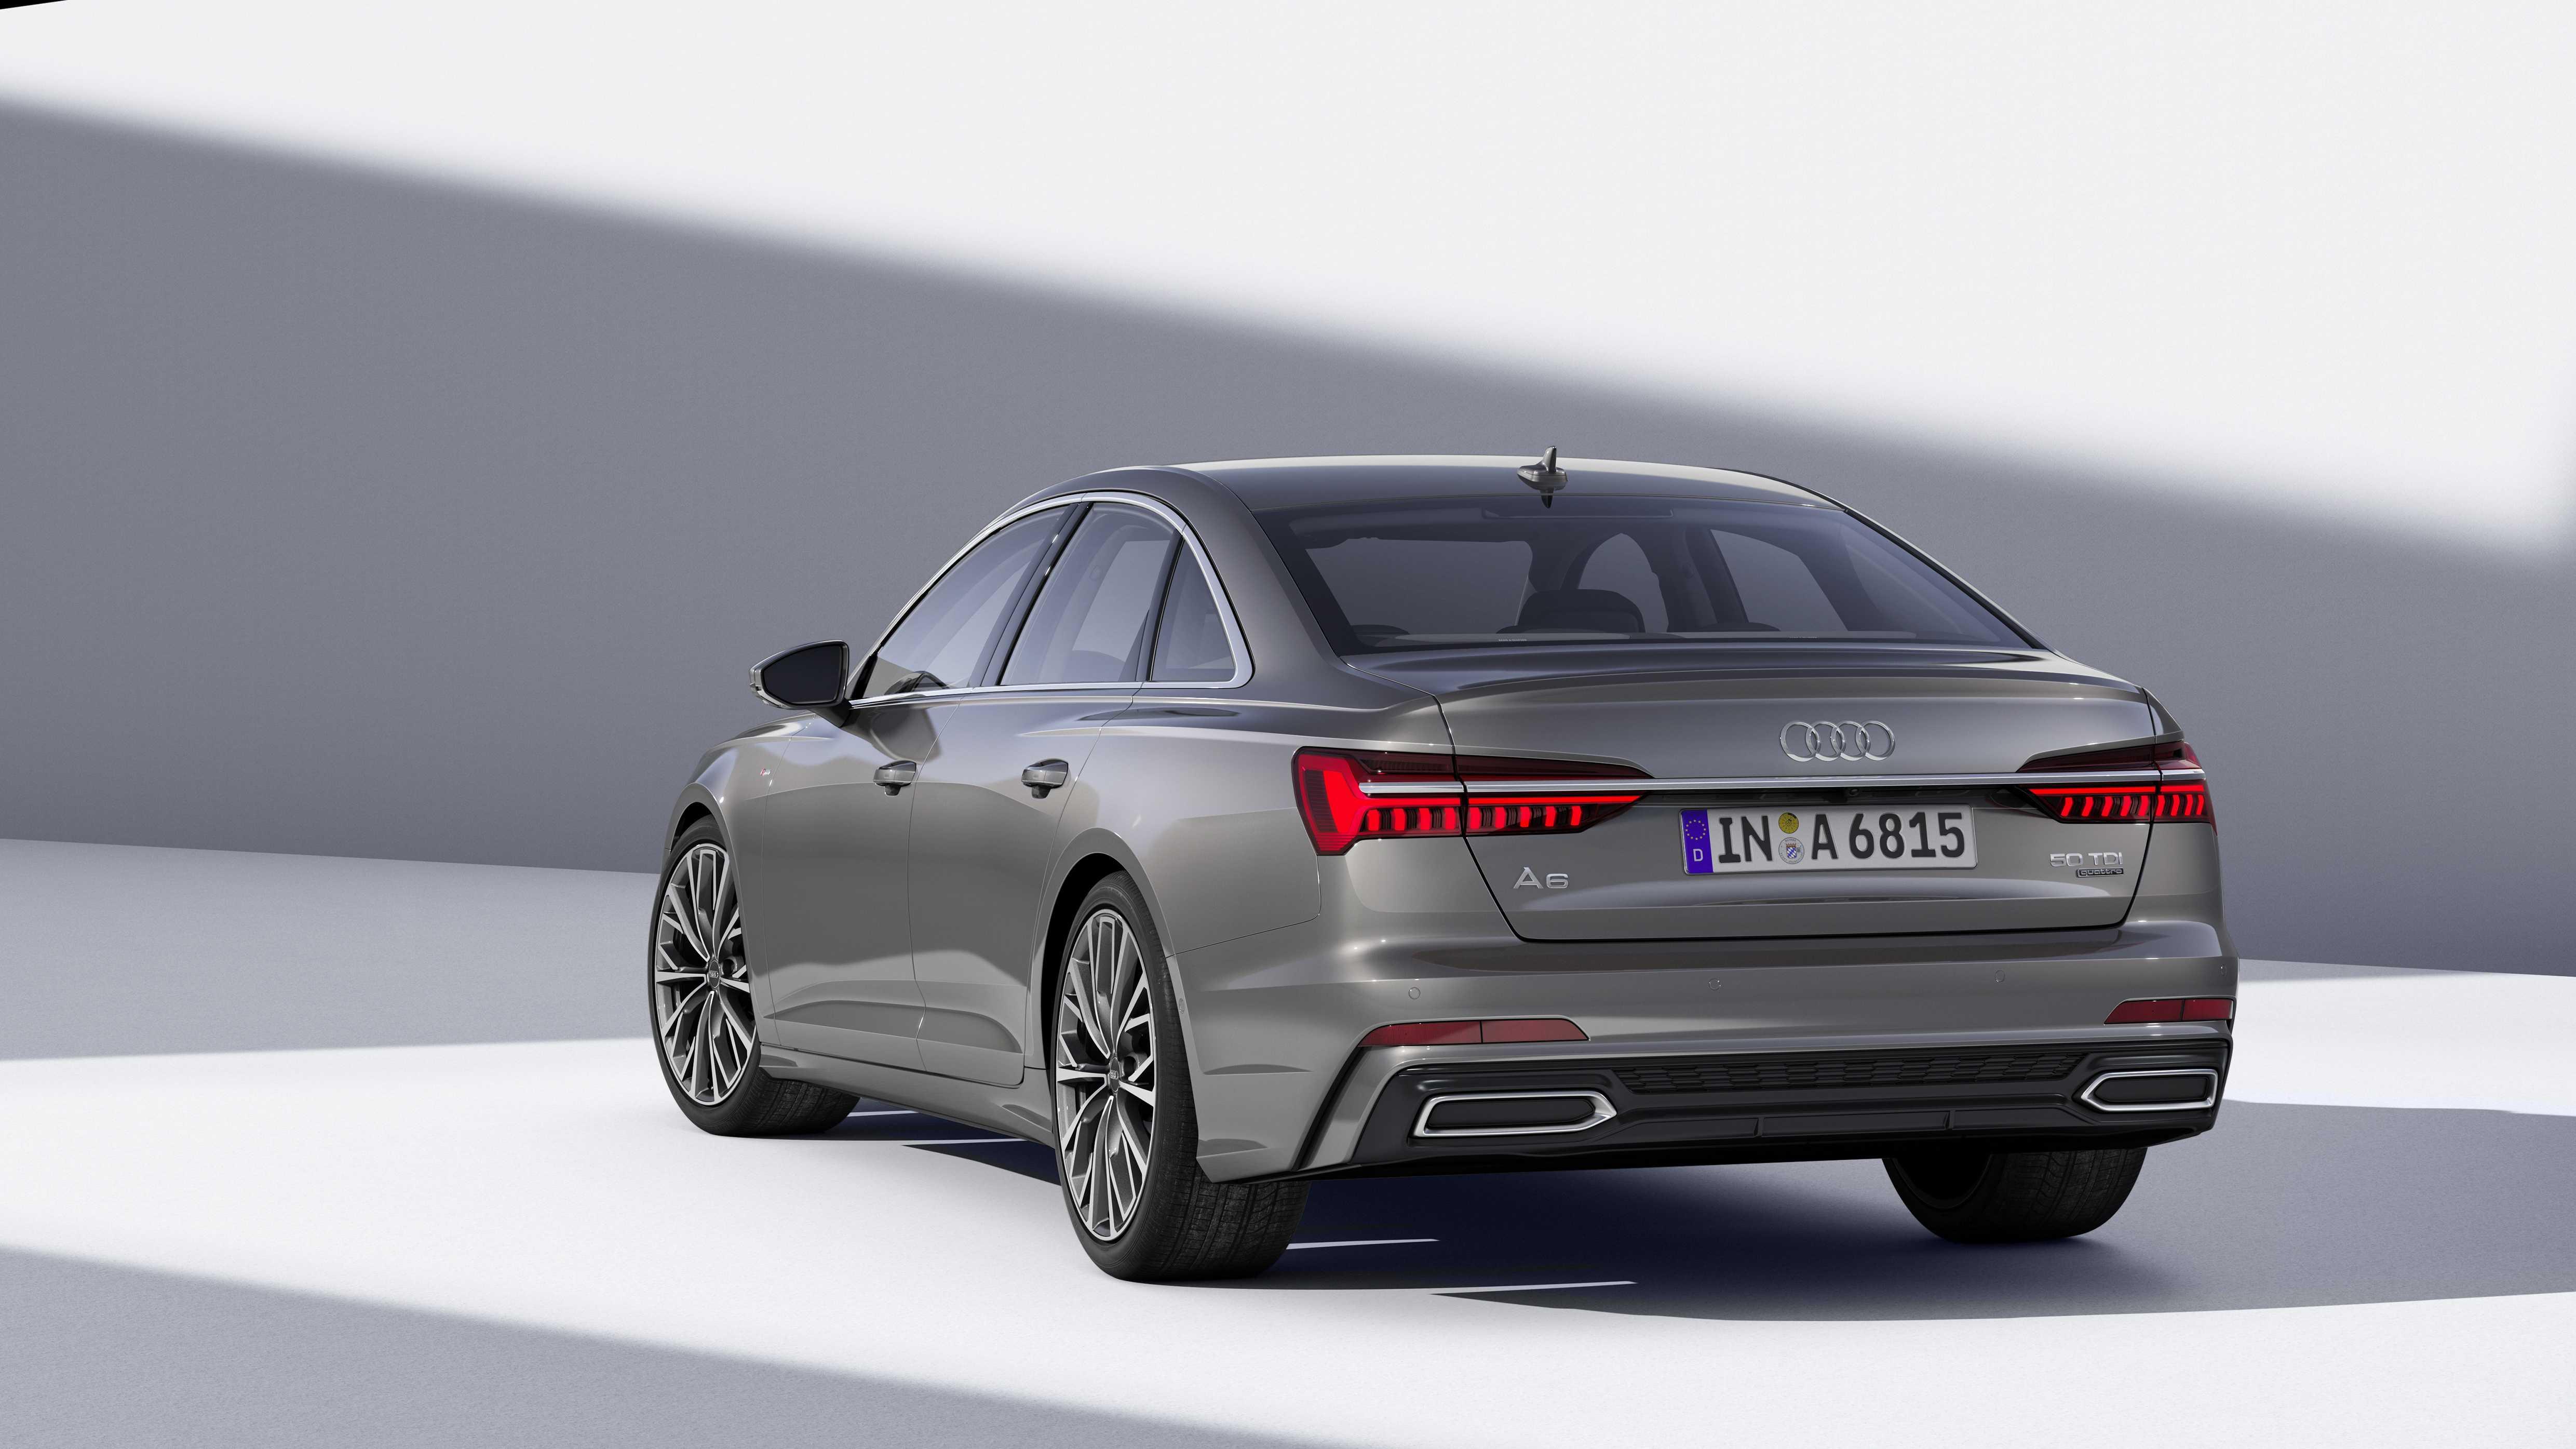 Kelebihan Kekurangan Audi A6 Diesel Murah Berkualitas